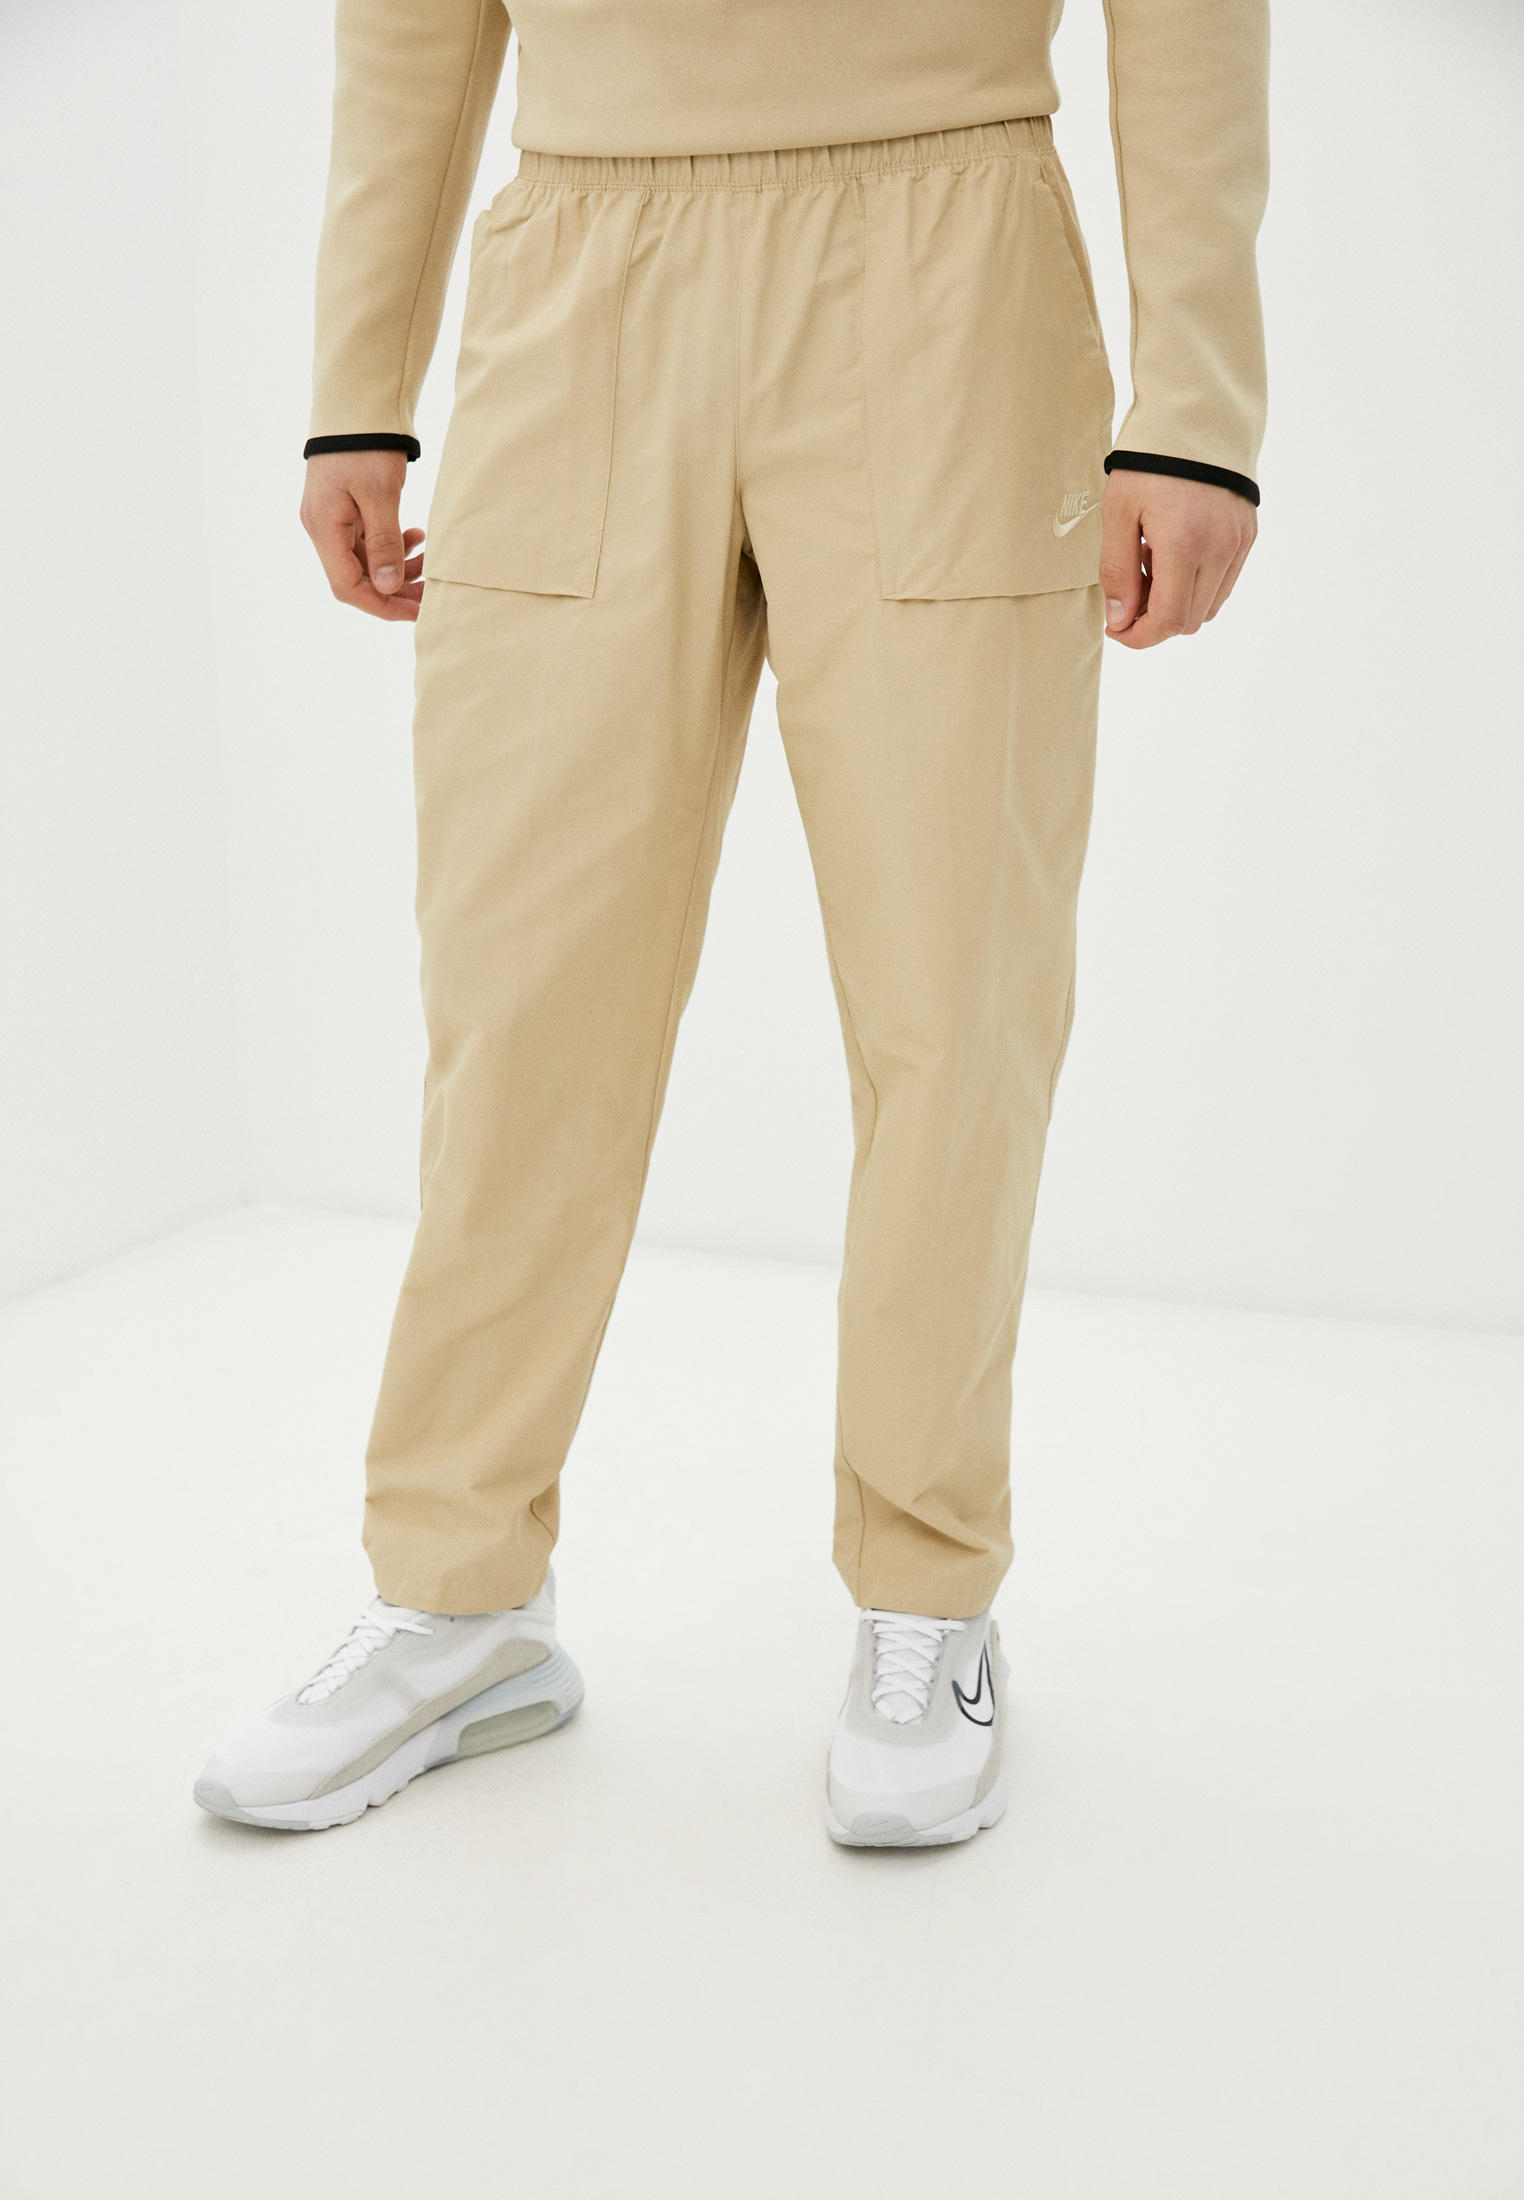 Мужские спортивные брюки Nike (Найк) Брюки Nike